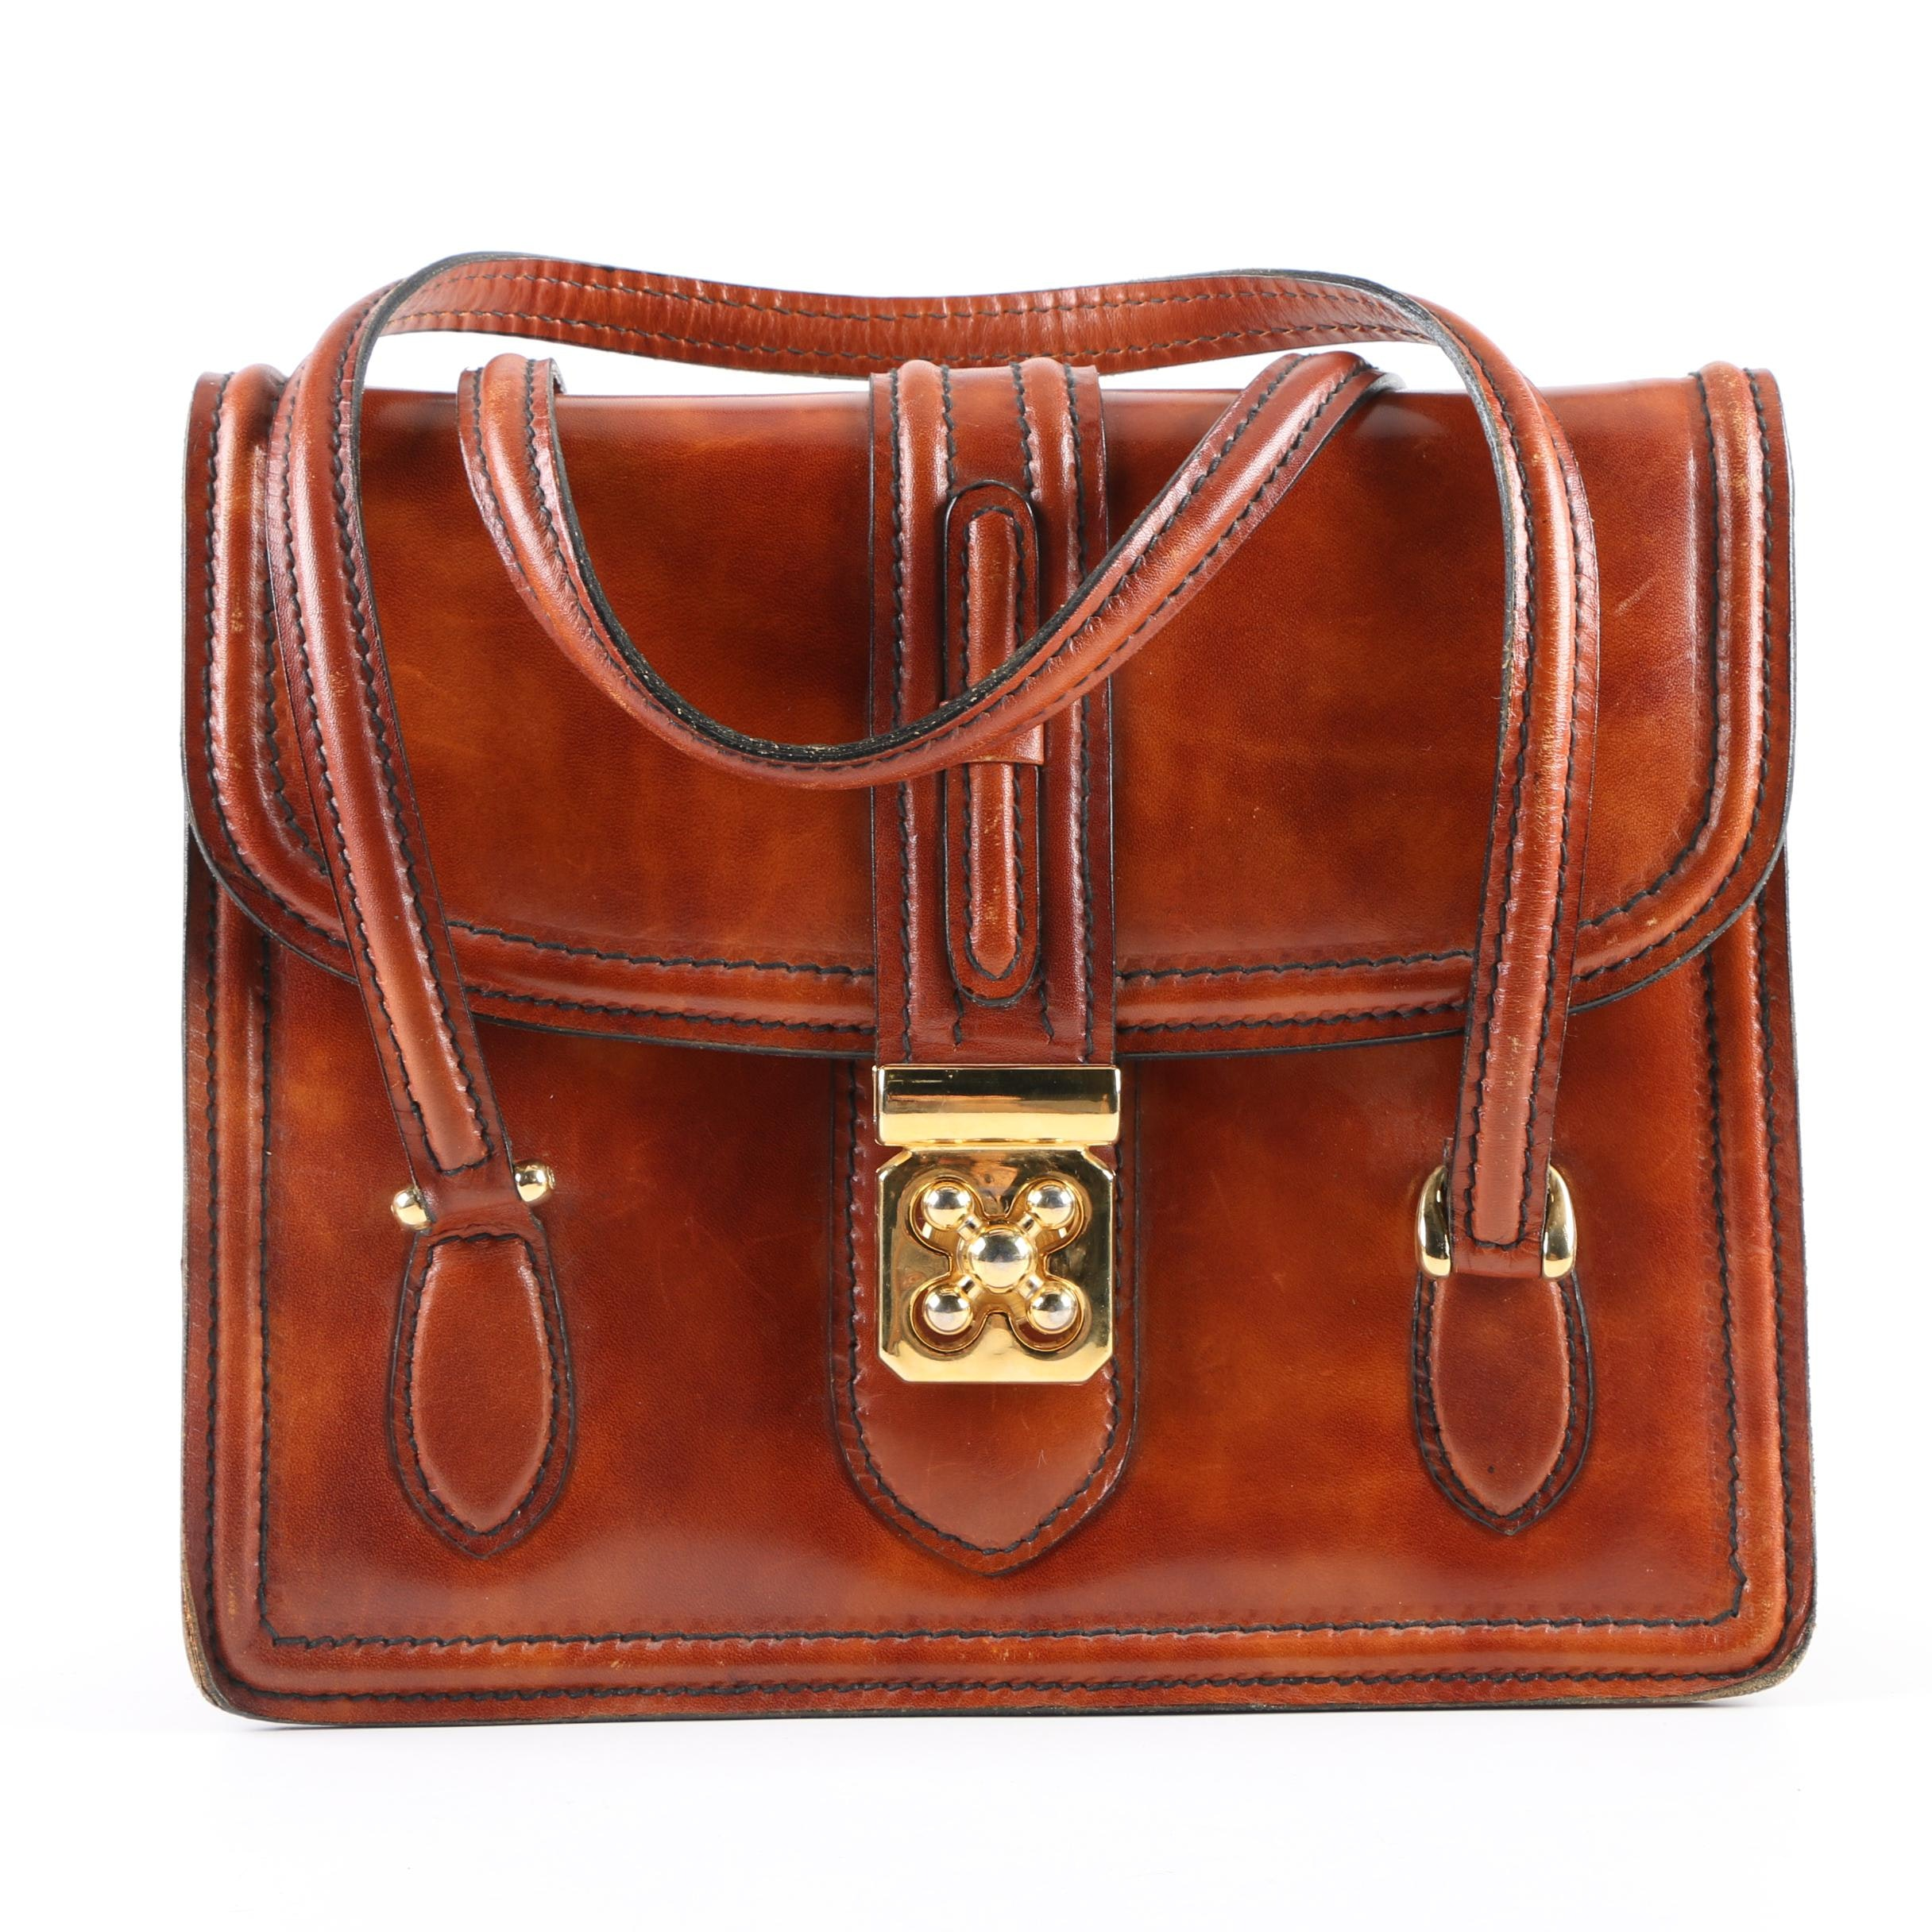 1960s Vintage Descagni of Italy Cognac Leather Satchel